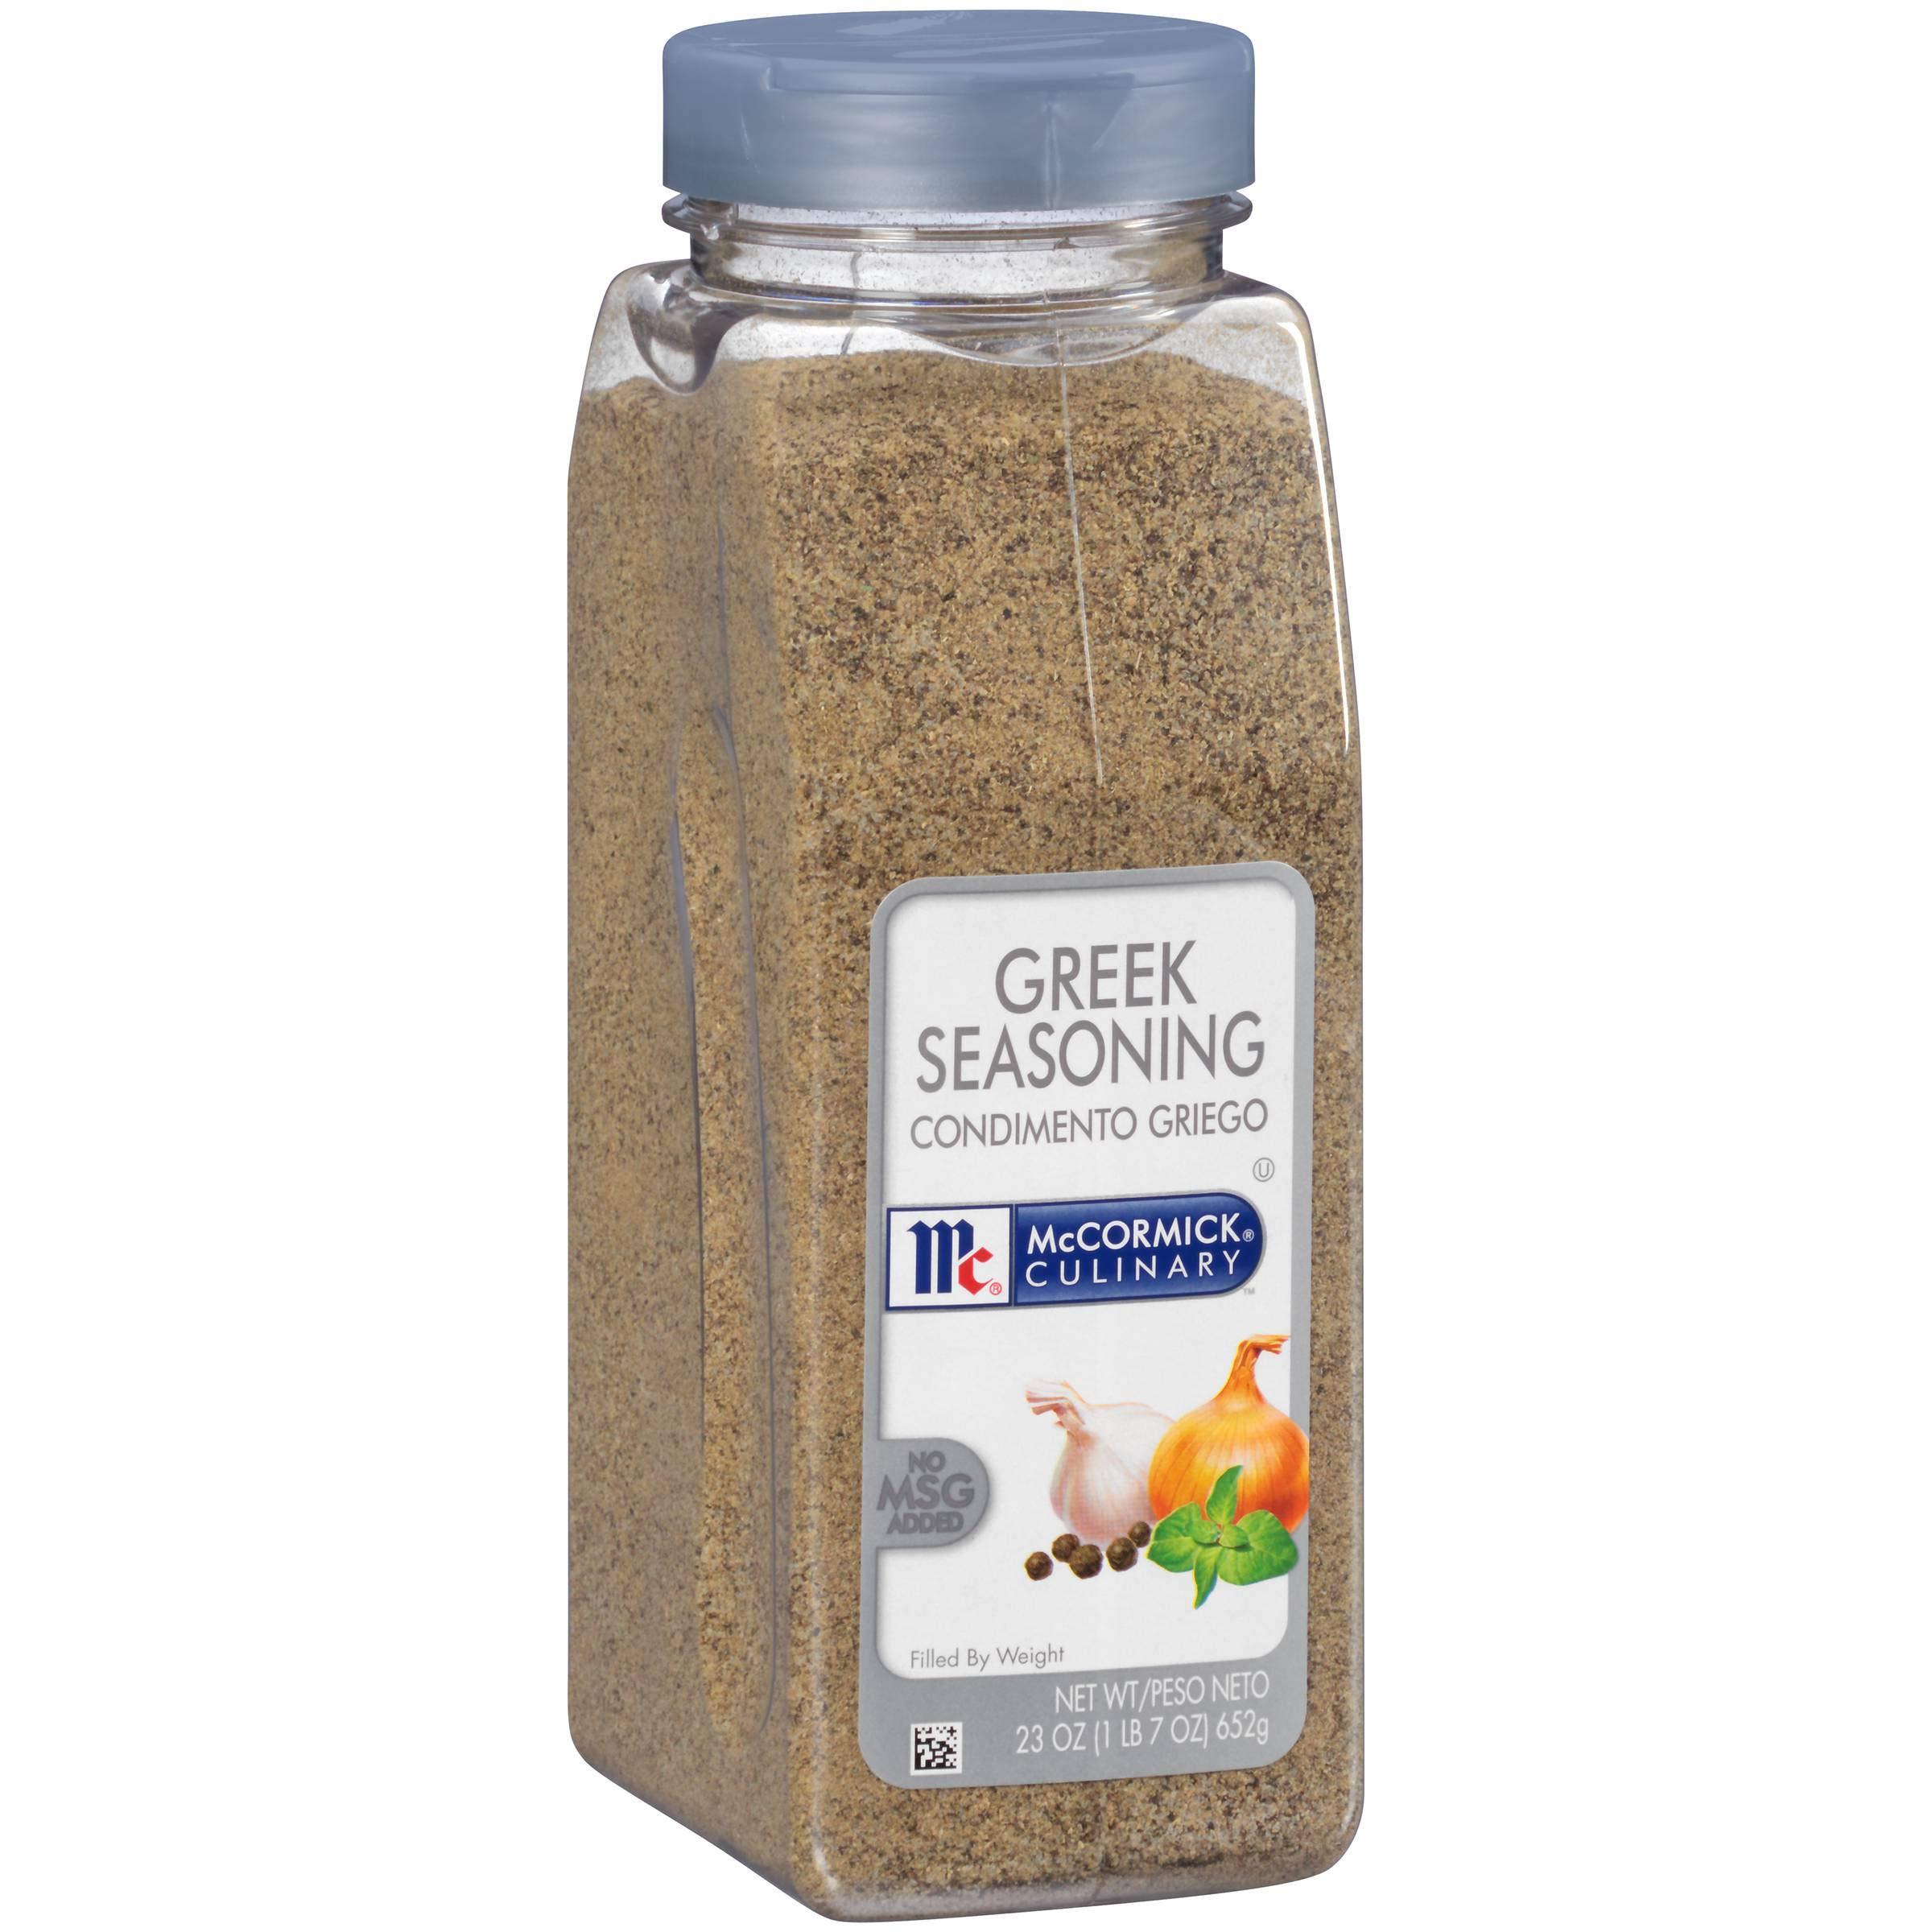 McCormick Greek Seasoning - 23 oz. container, 6 per case